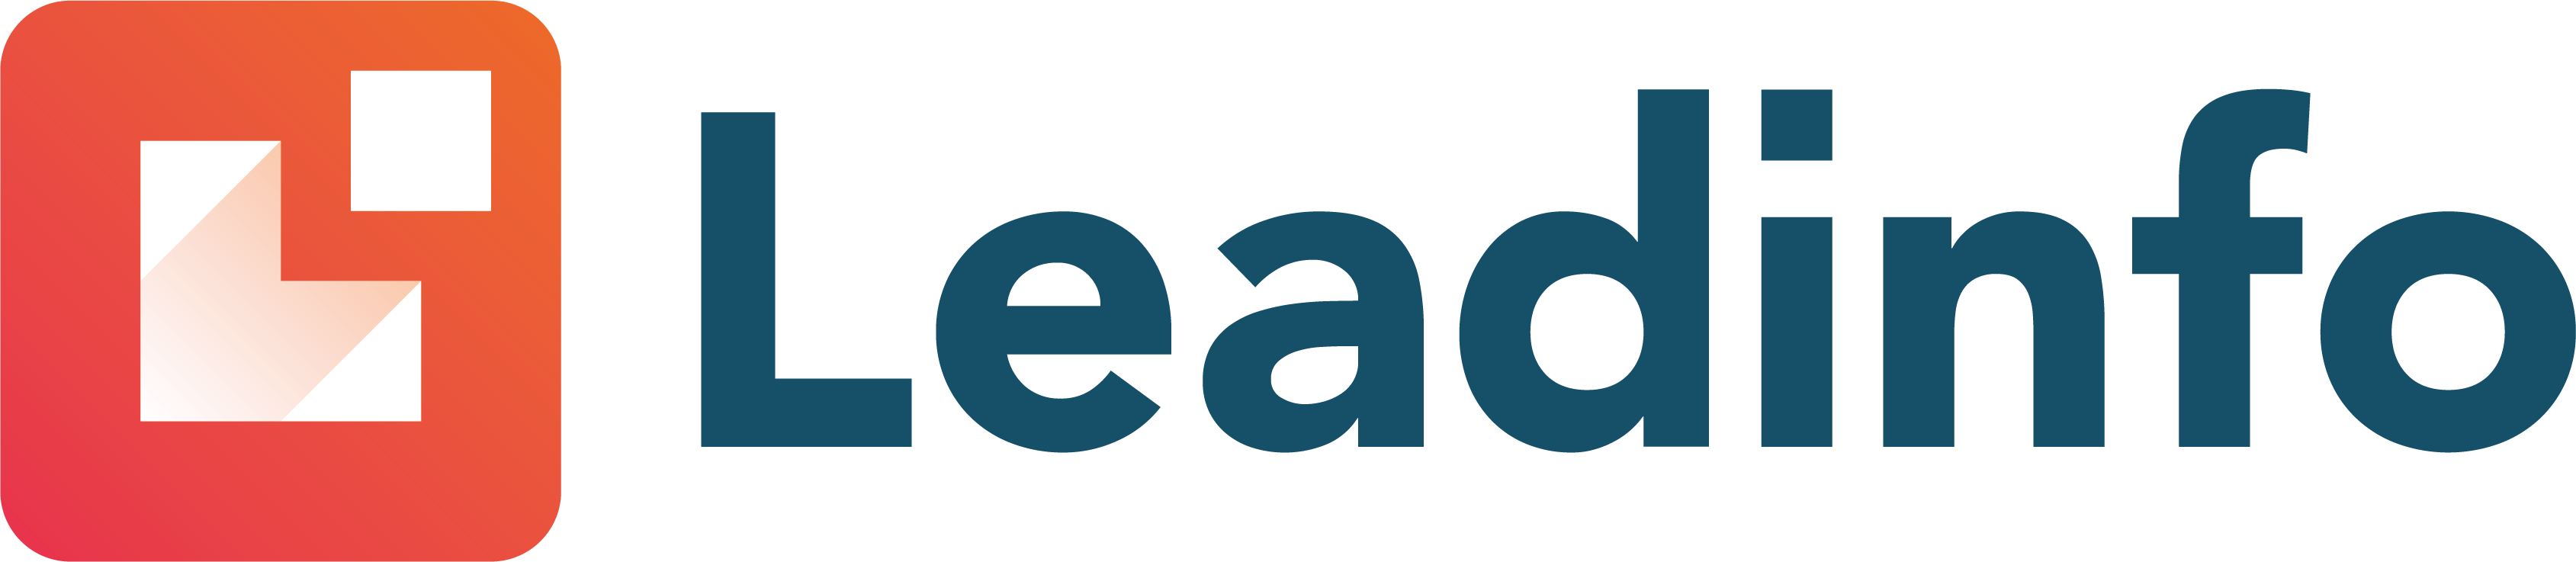 Leadinfo Logo high res